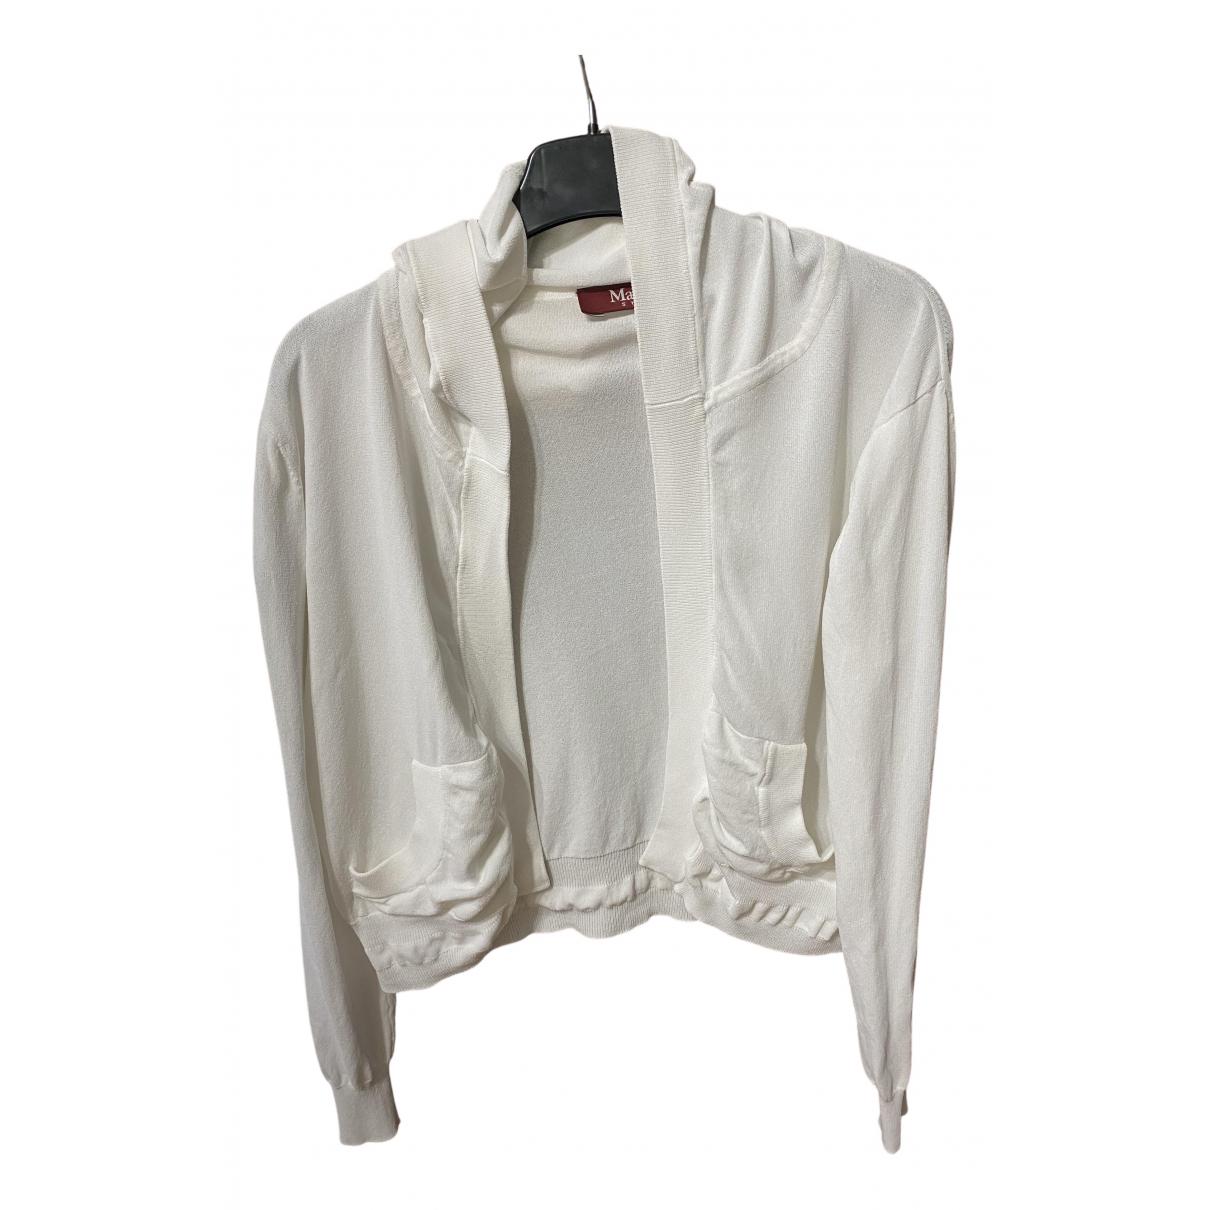 Max Mara Studio N White Knitwear for Women M International